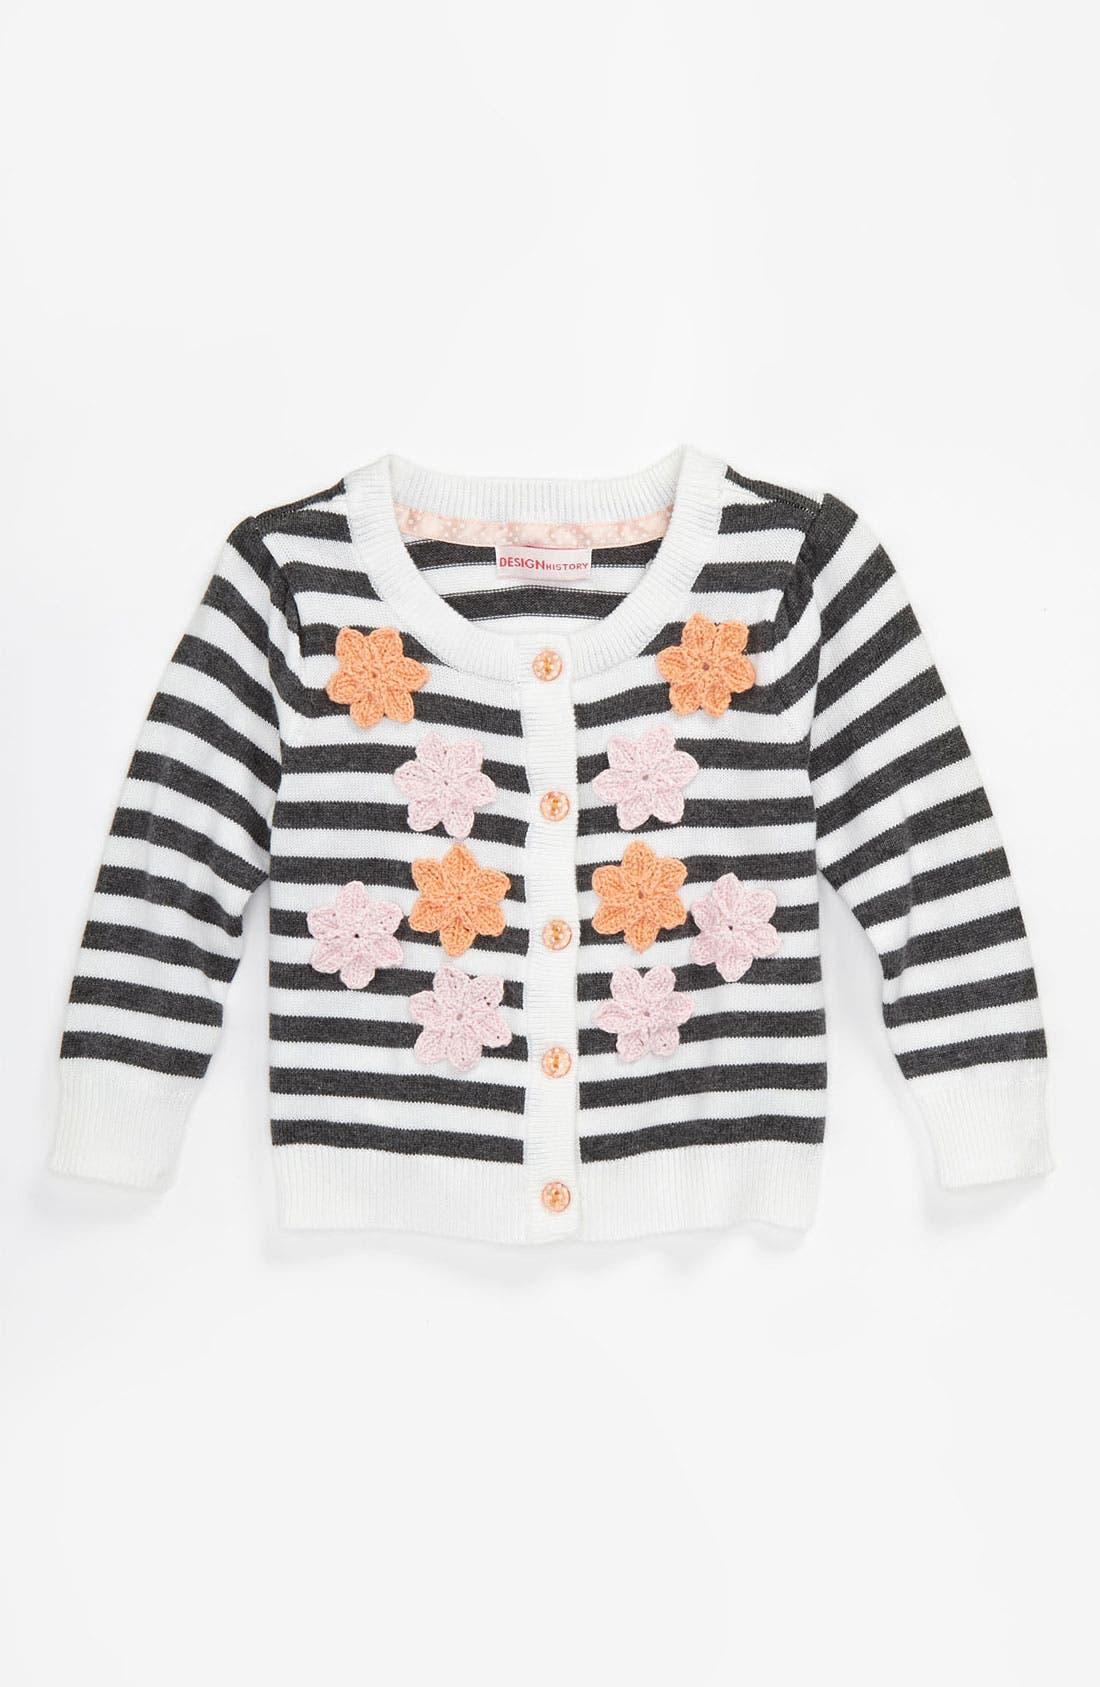 Main Image - Design History Stripe Cardigan (Toddler)